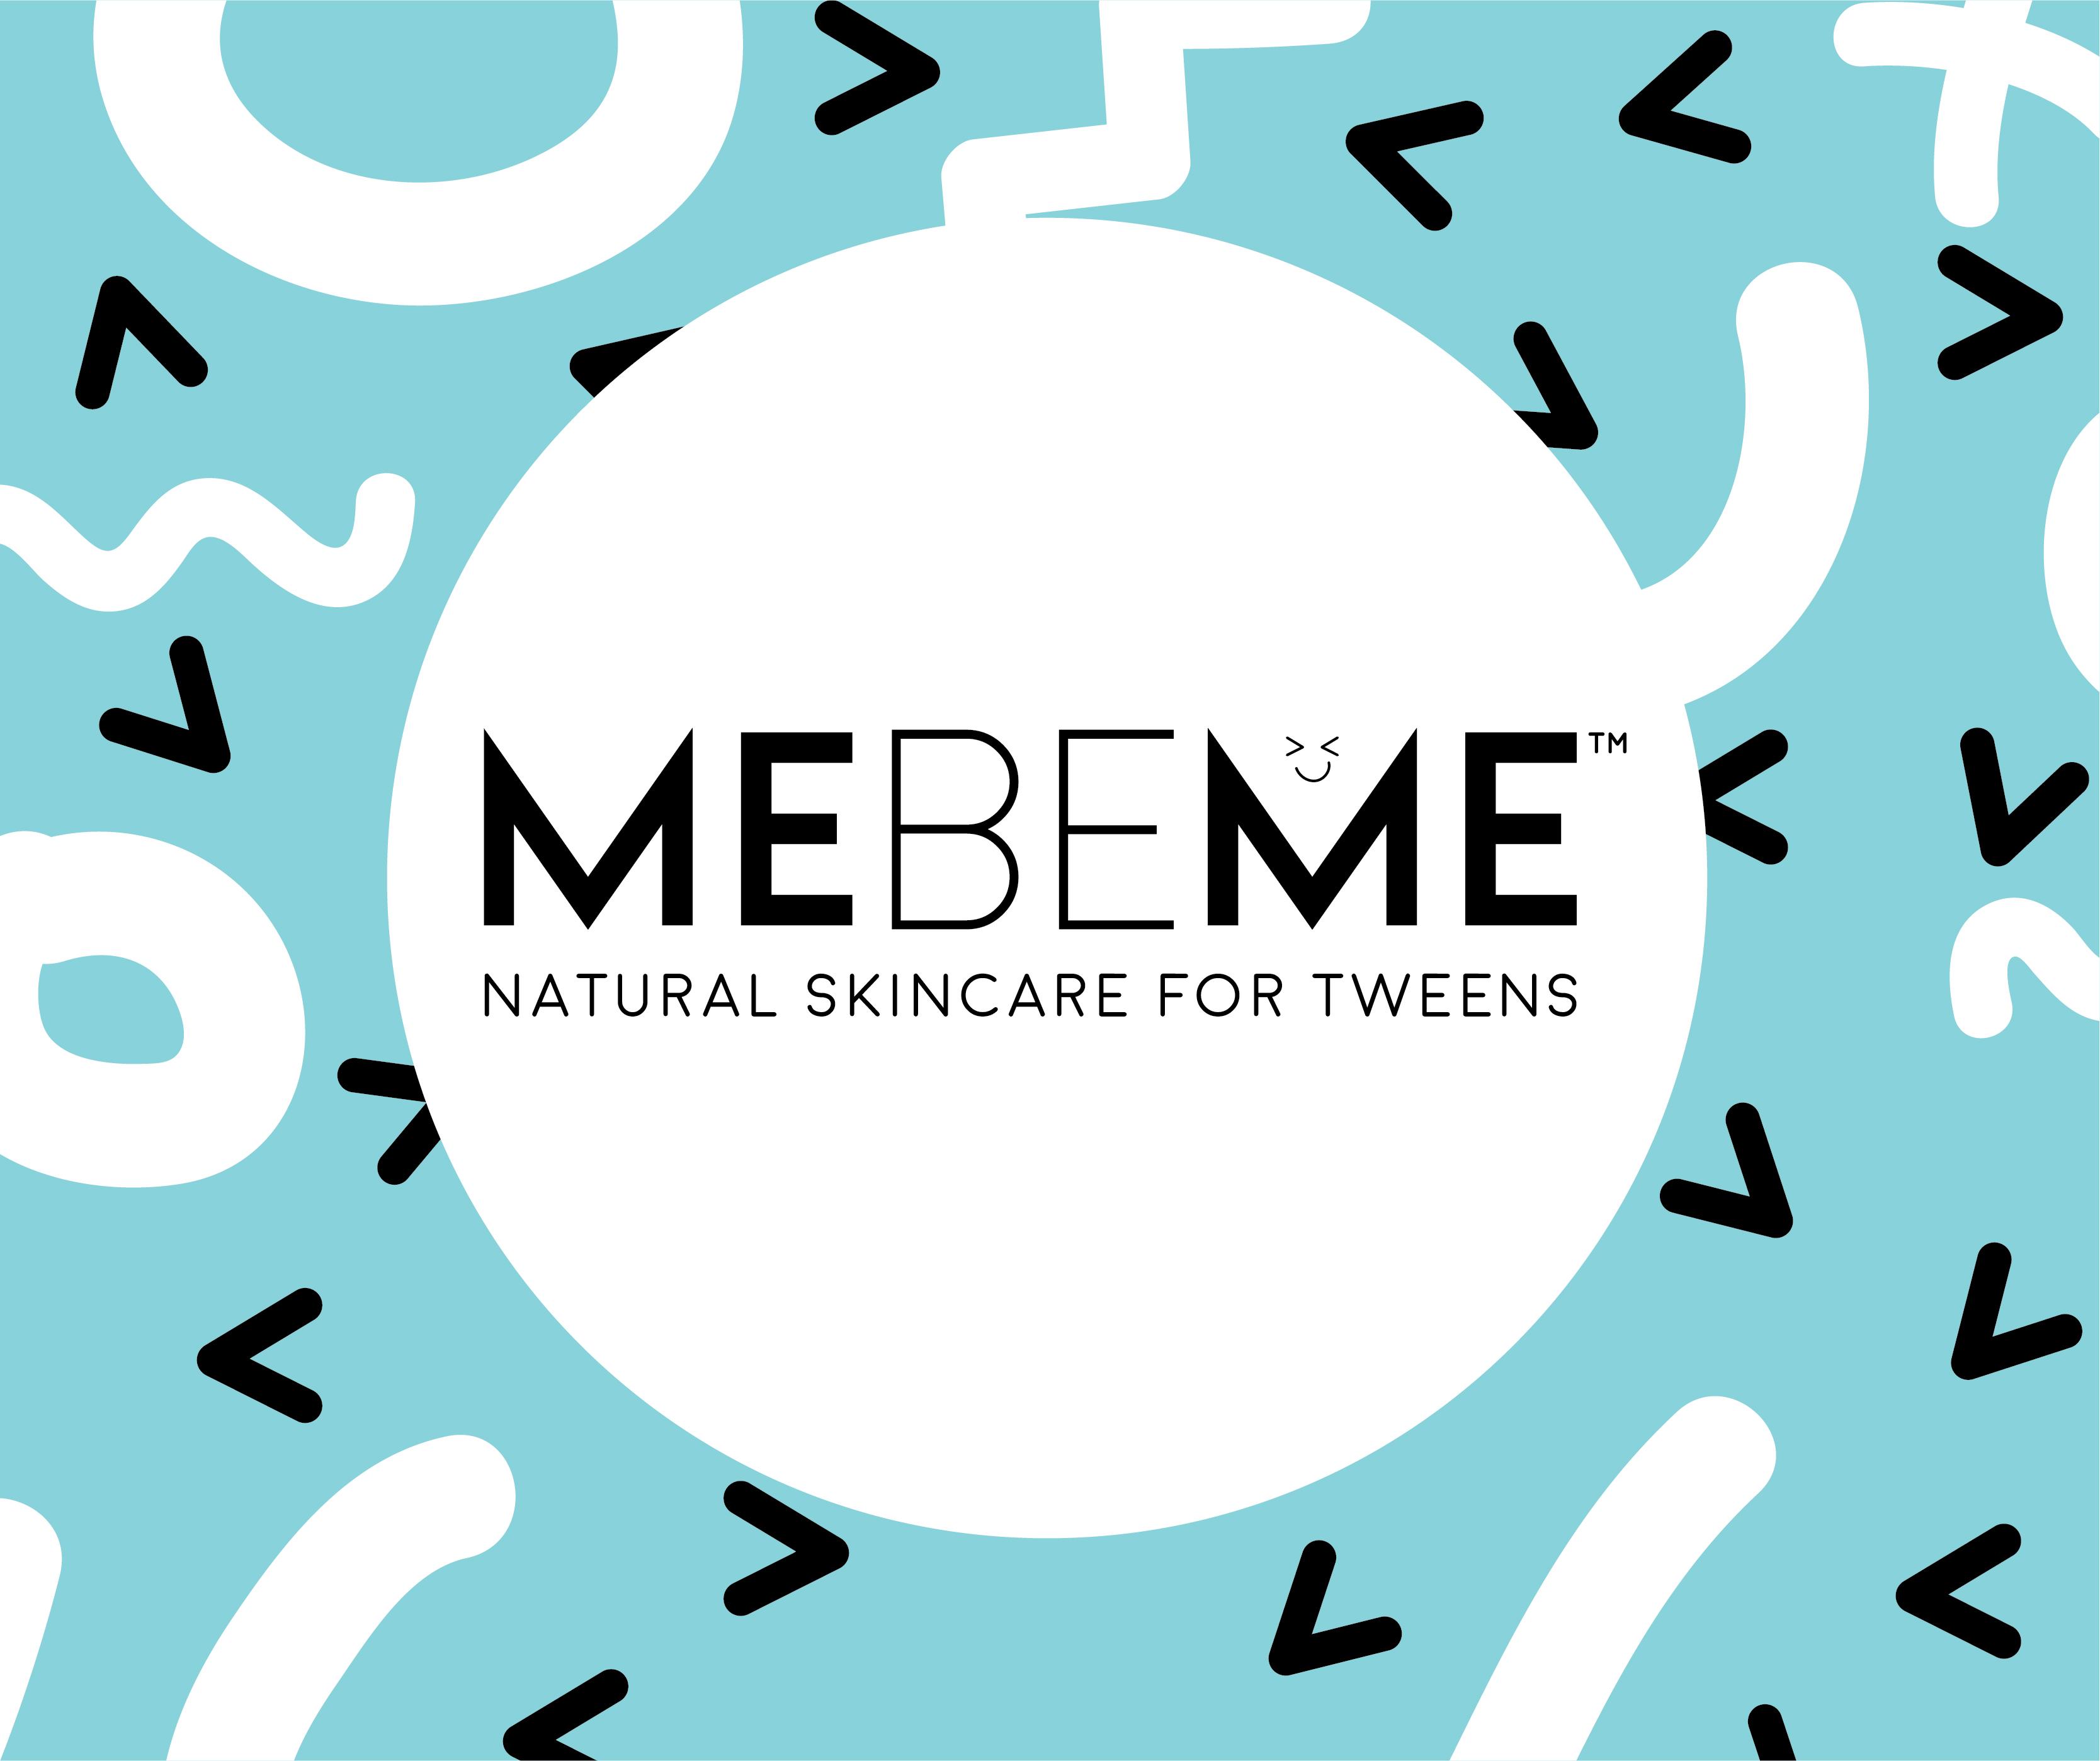 mebeme website image